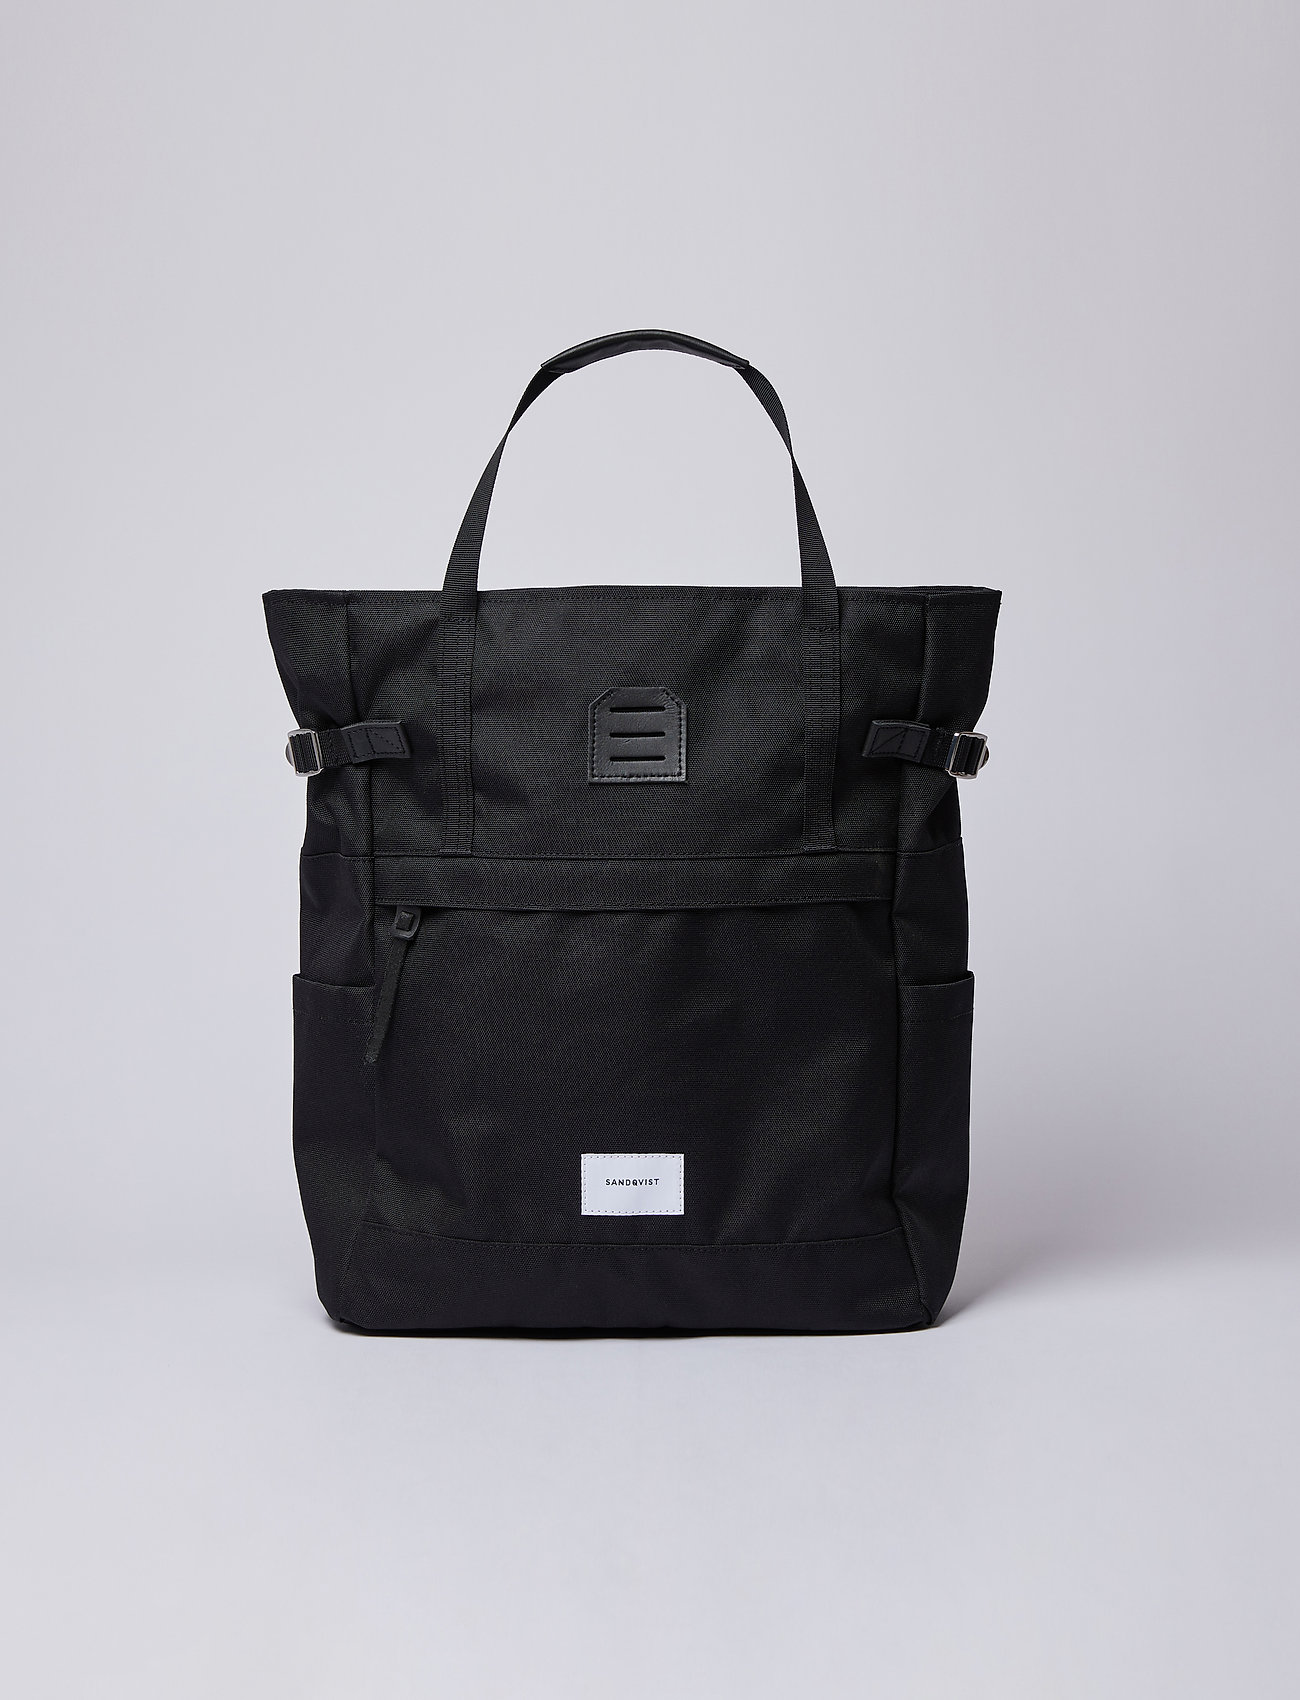 SANDQVIST - ROGER - nieuwe mode - black with black leather - 0